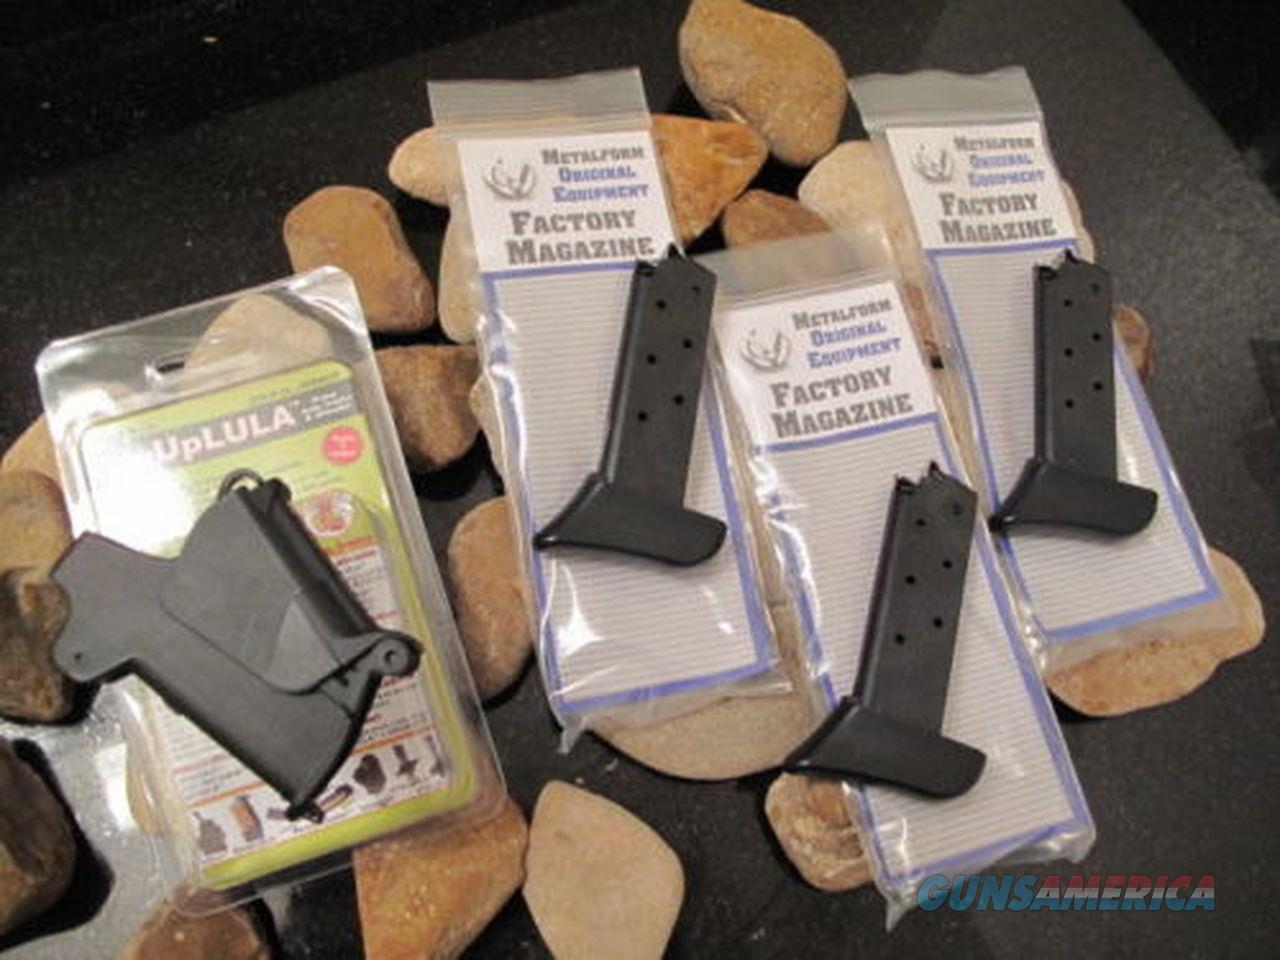 3-Pack Fits Sig EXTENDED p238 380 .380 7-RD Magazines + BABY UPLULA SPEEDLOADER  Non-Guns > Ammunition